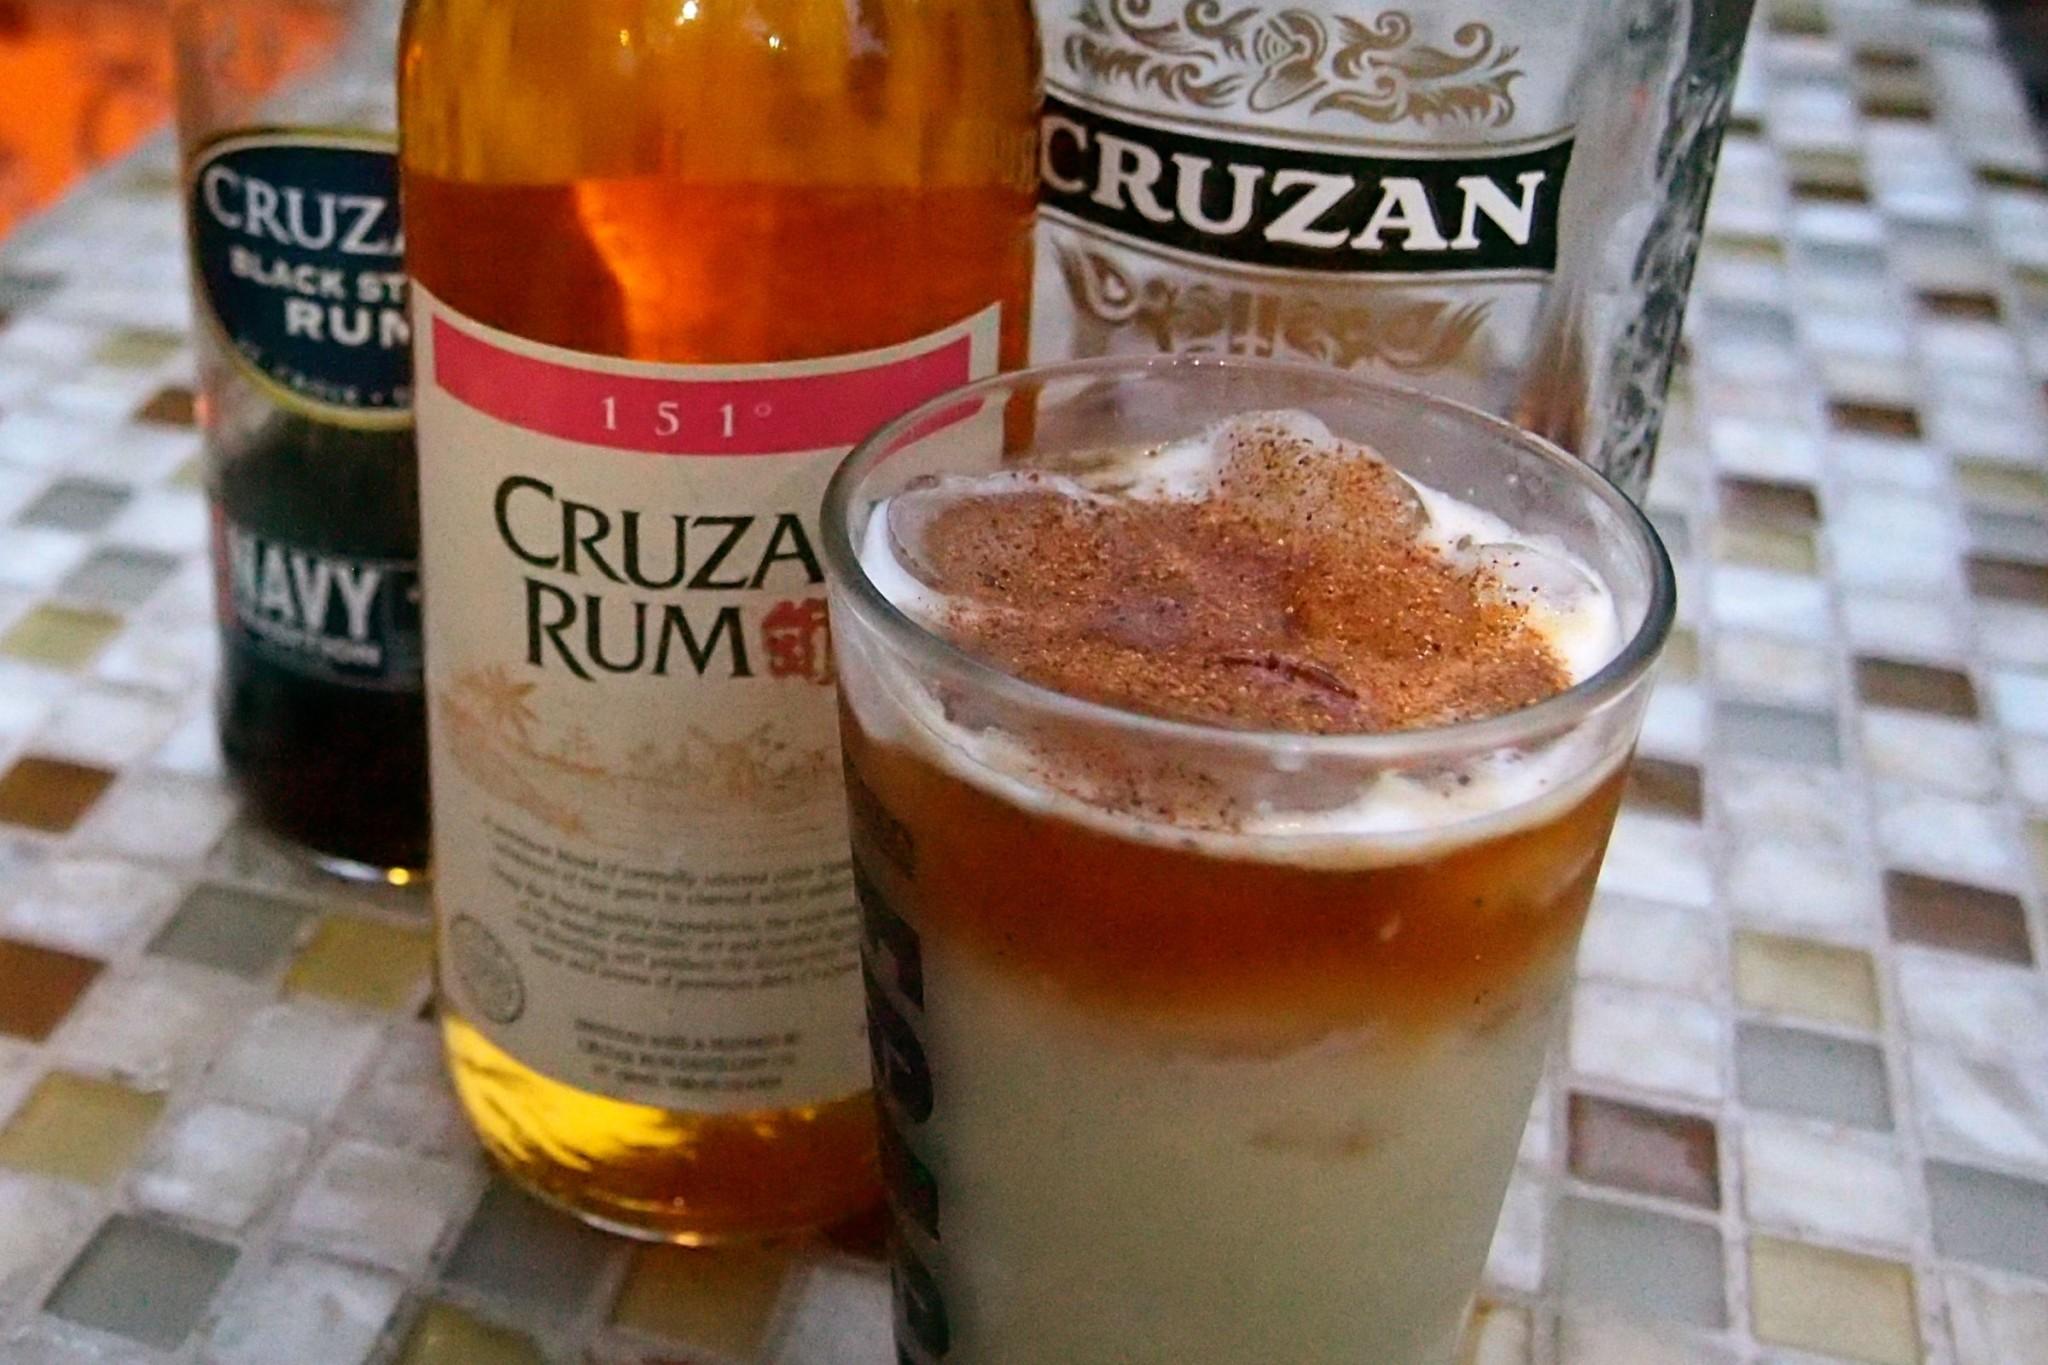 The Cruzan Painkiller Recipe – Can You Handle The Kick?